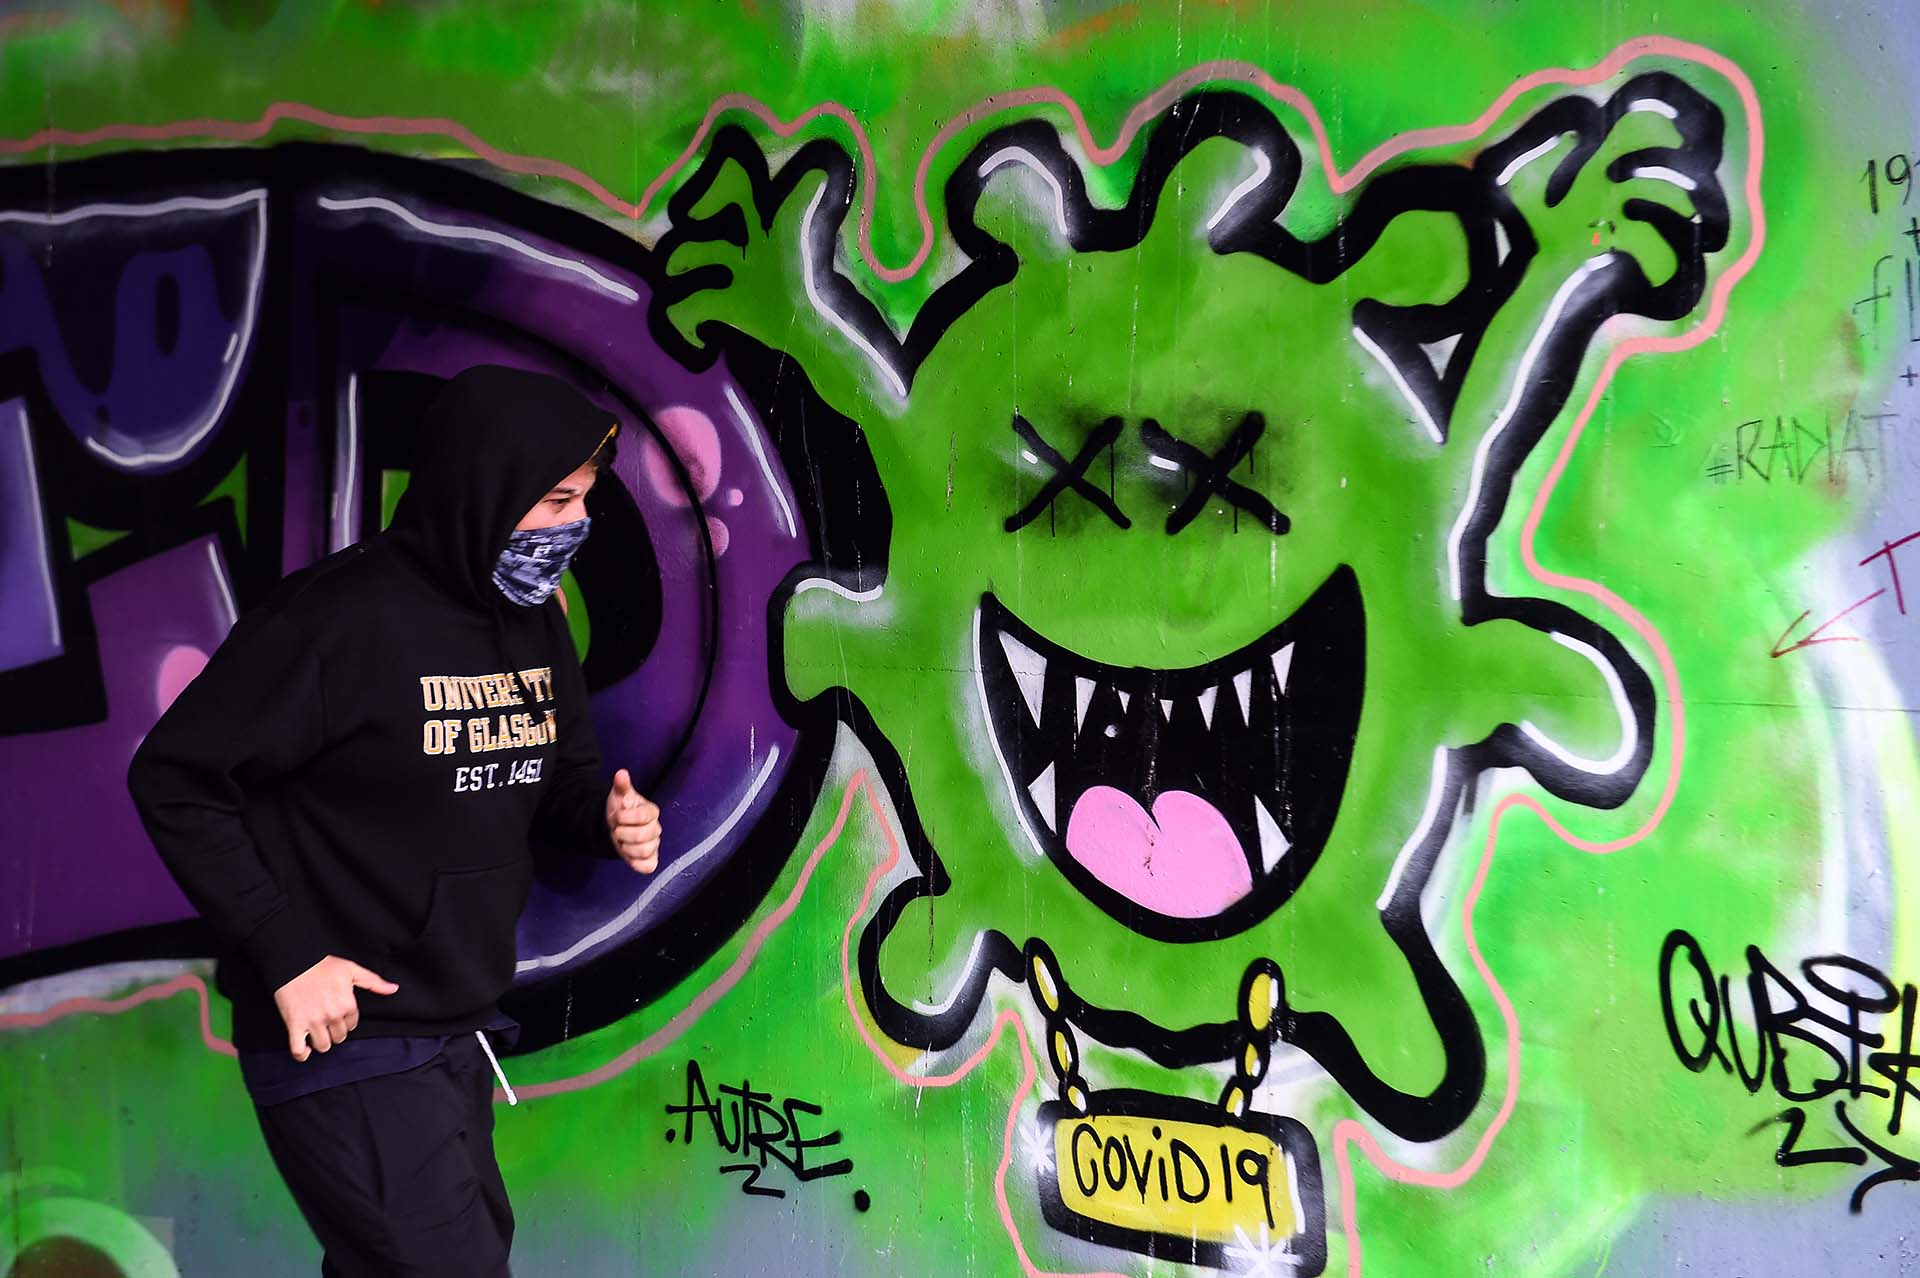 Un corredor pasa frente aun grafitti del coronavirus en una pared de Glasgow en Escocia.